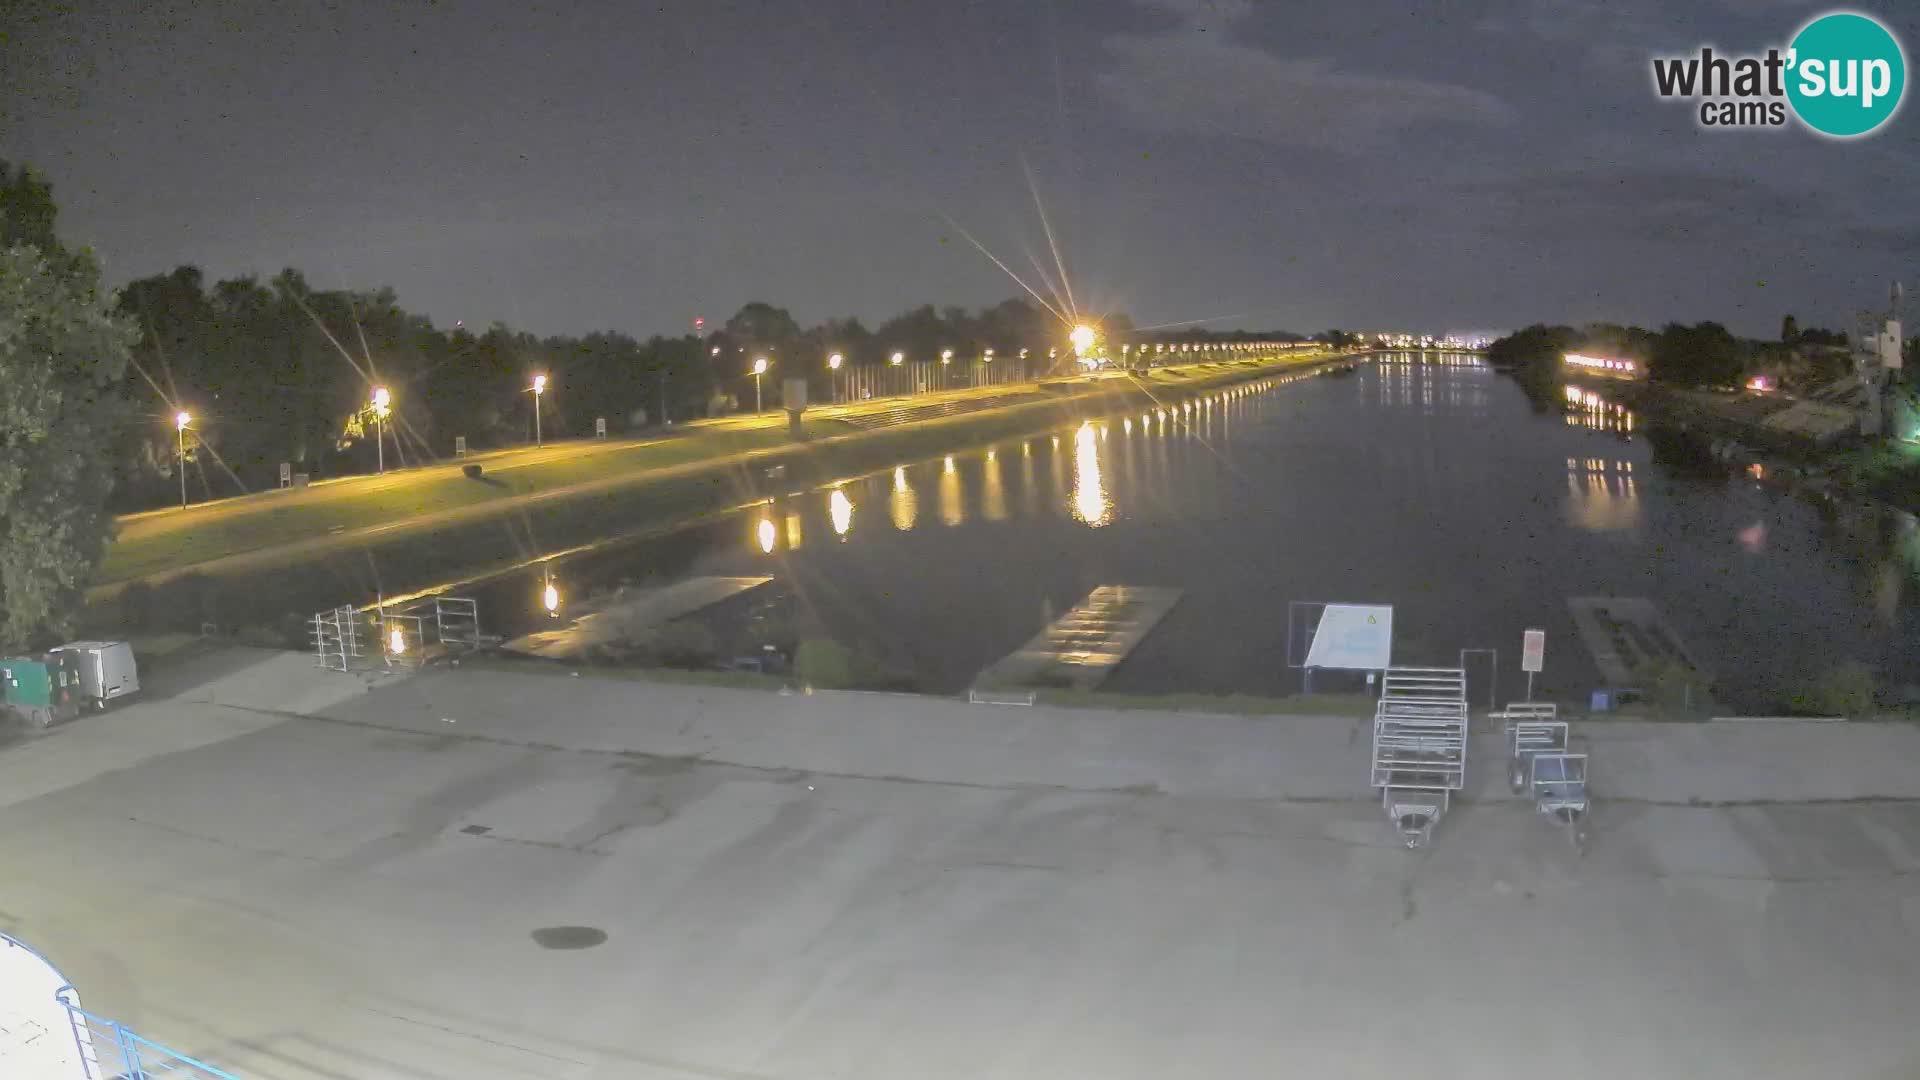 Zagreb Jezero Jarun Whatsupcams Kamere U Zivo